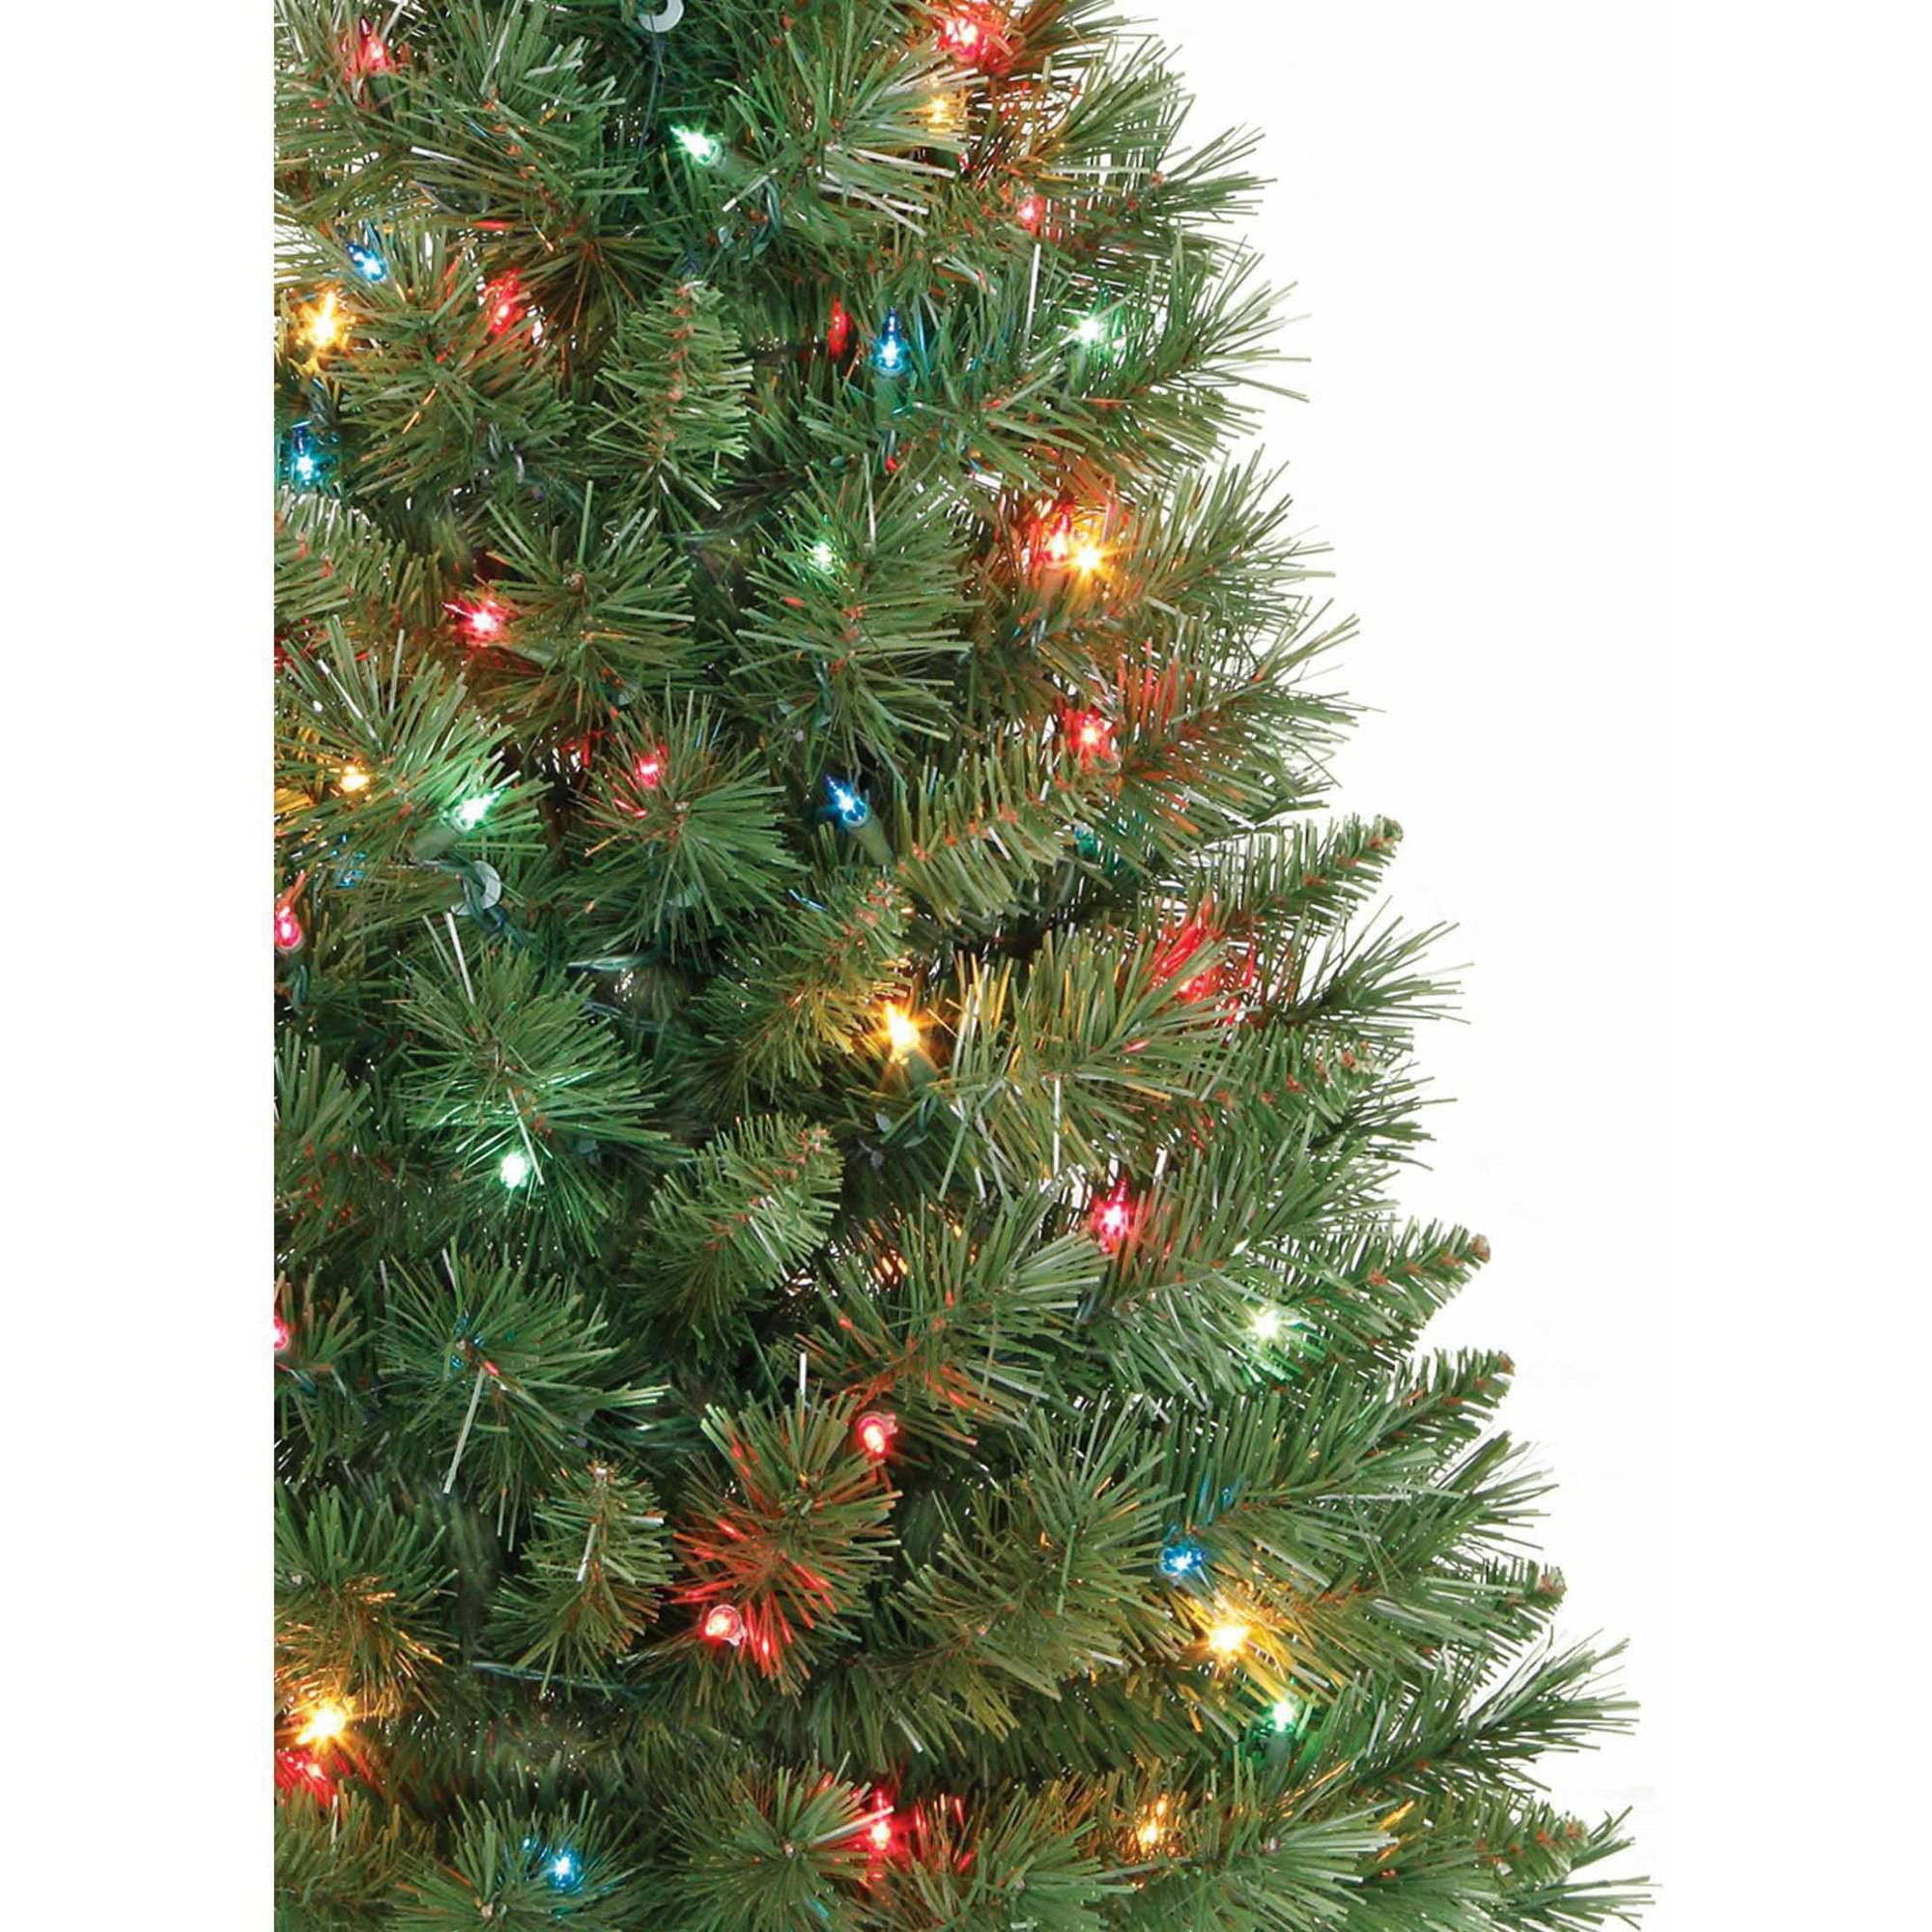 Crestwood small artificial christmas tree with plastic bronze pot - Artificial Christmas Tree Pre Lit 3 Winston Pine Multi Lights Walmart Com